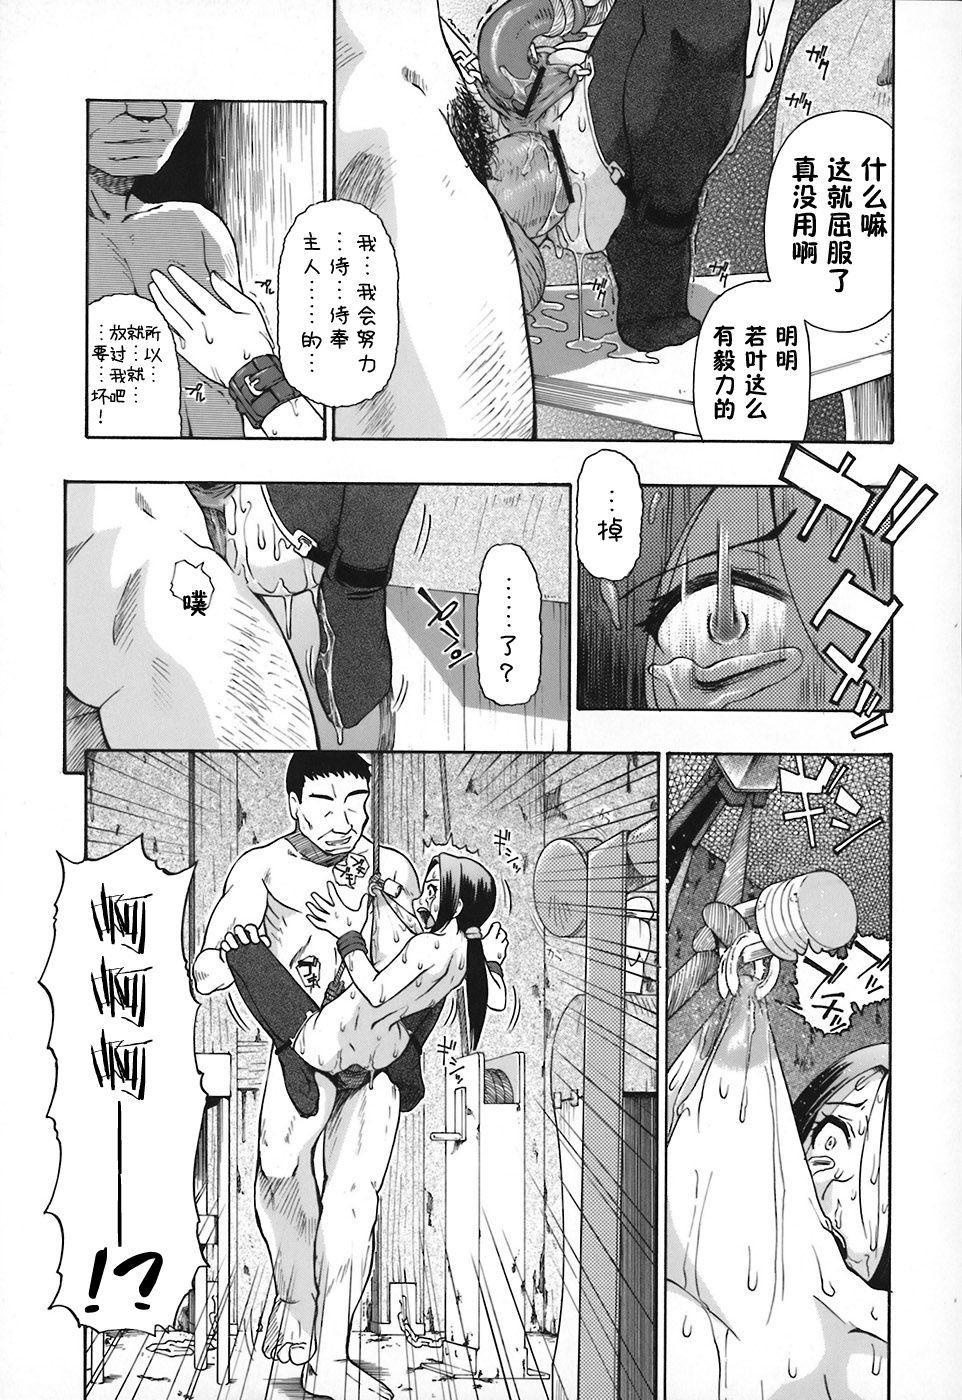 Akutoku no Sakae - Prosperites du Vice 88